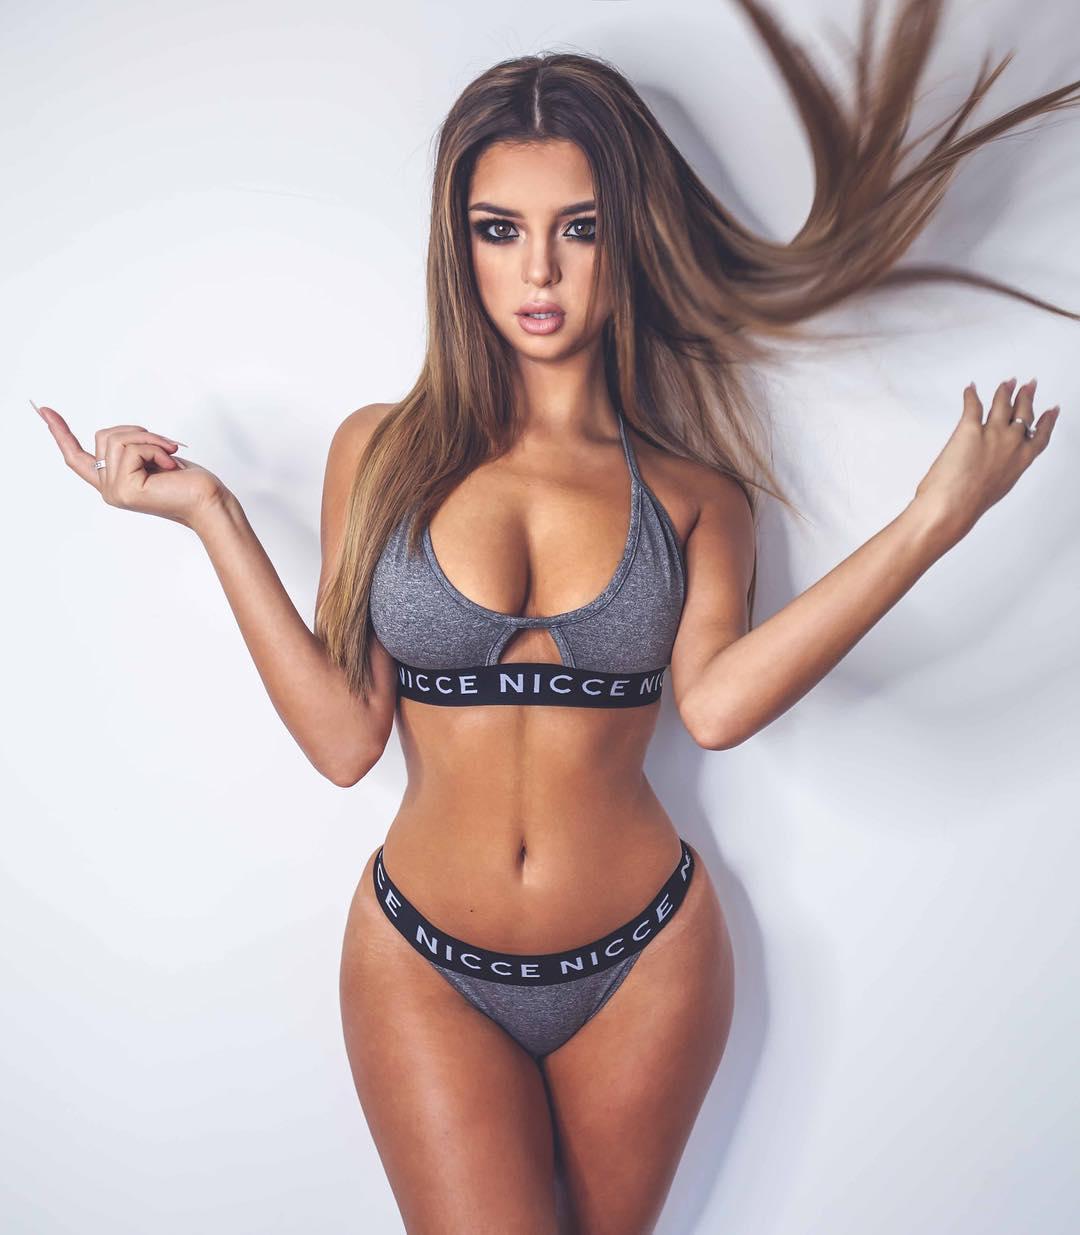 Perky b cup boobs